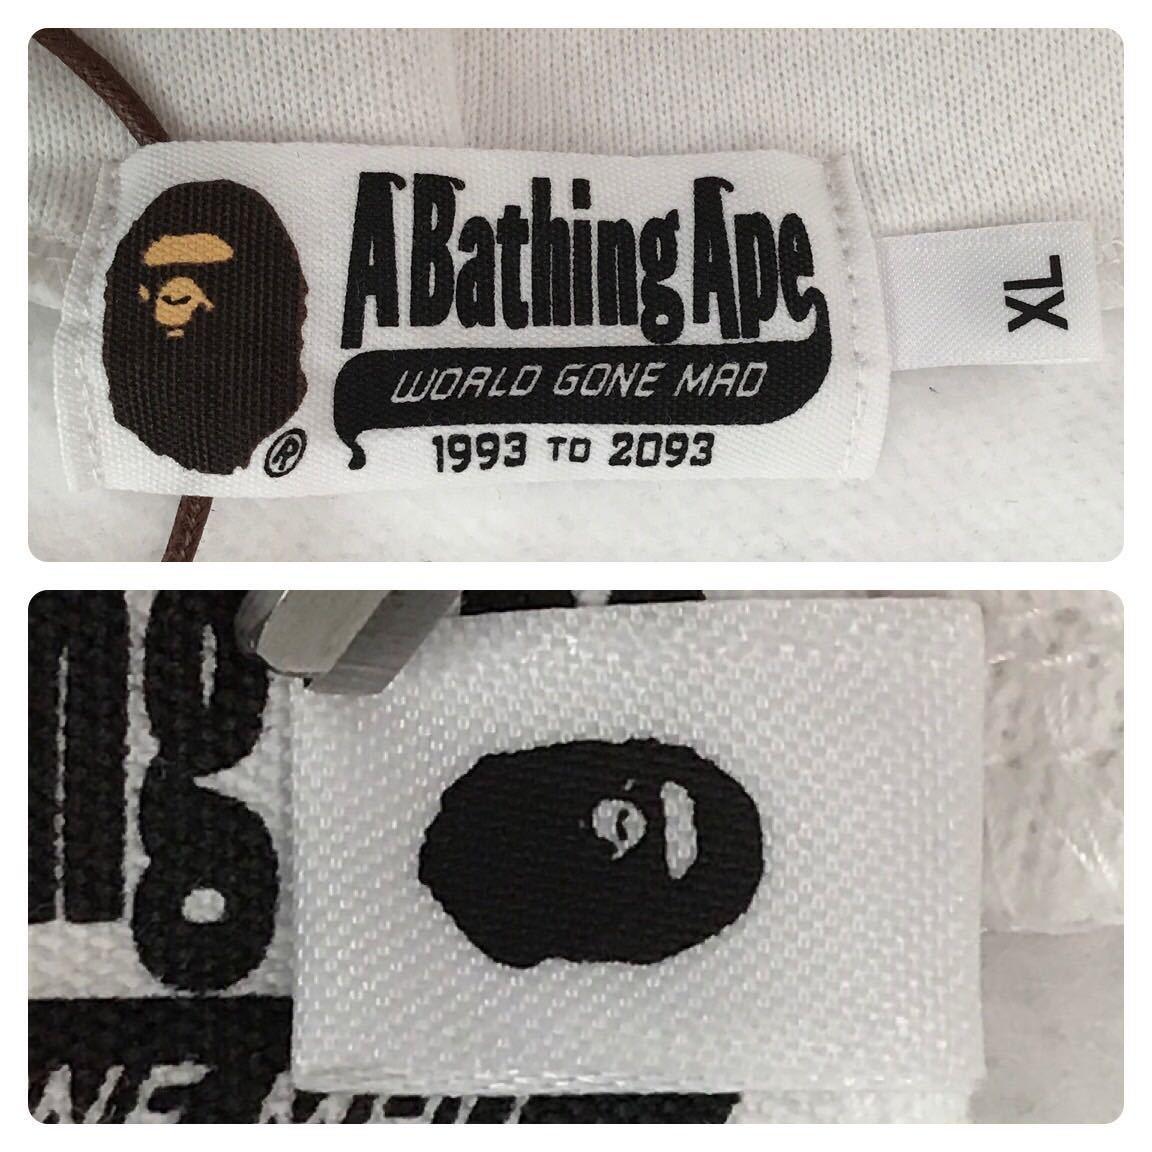 ★新品★ Warm up camo シャーク パーカー XLサイズ a bathing ape BAPE shark full zip hoodie エイプ ベイプ アベイシングエイプ 迷彩 32